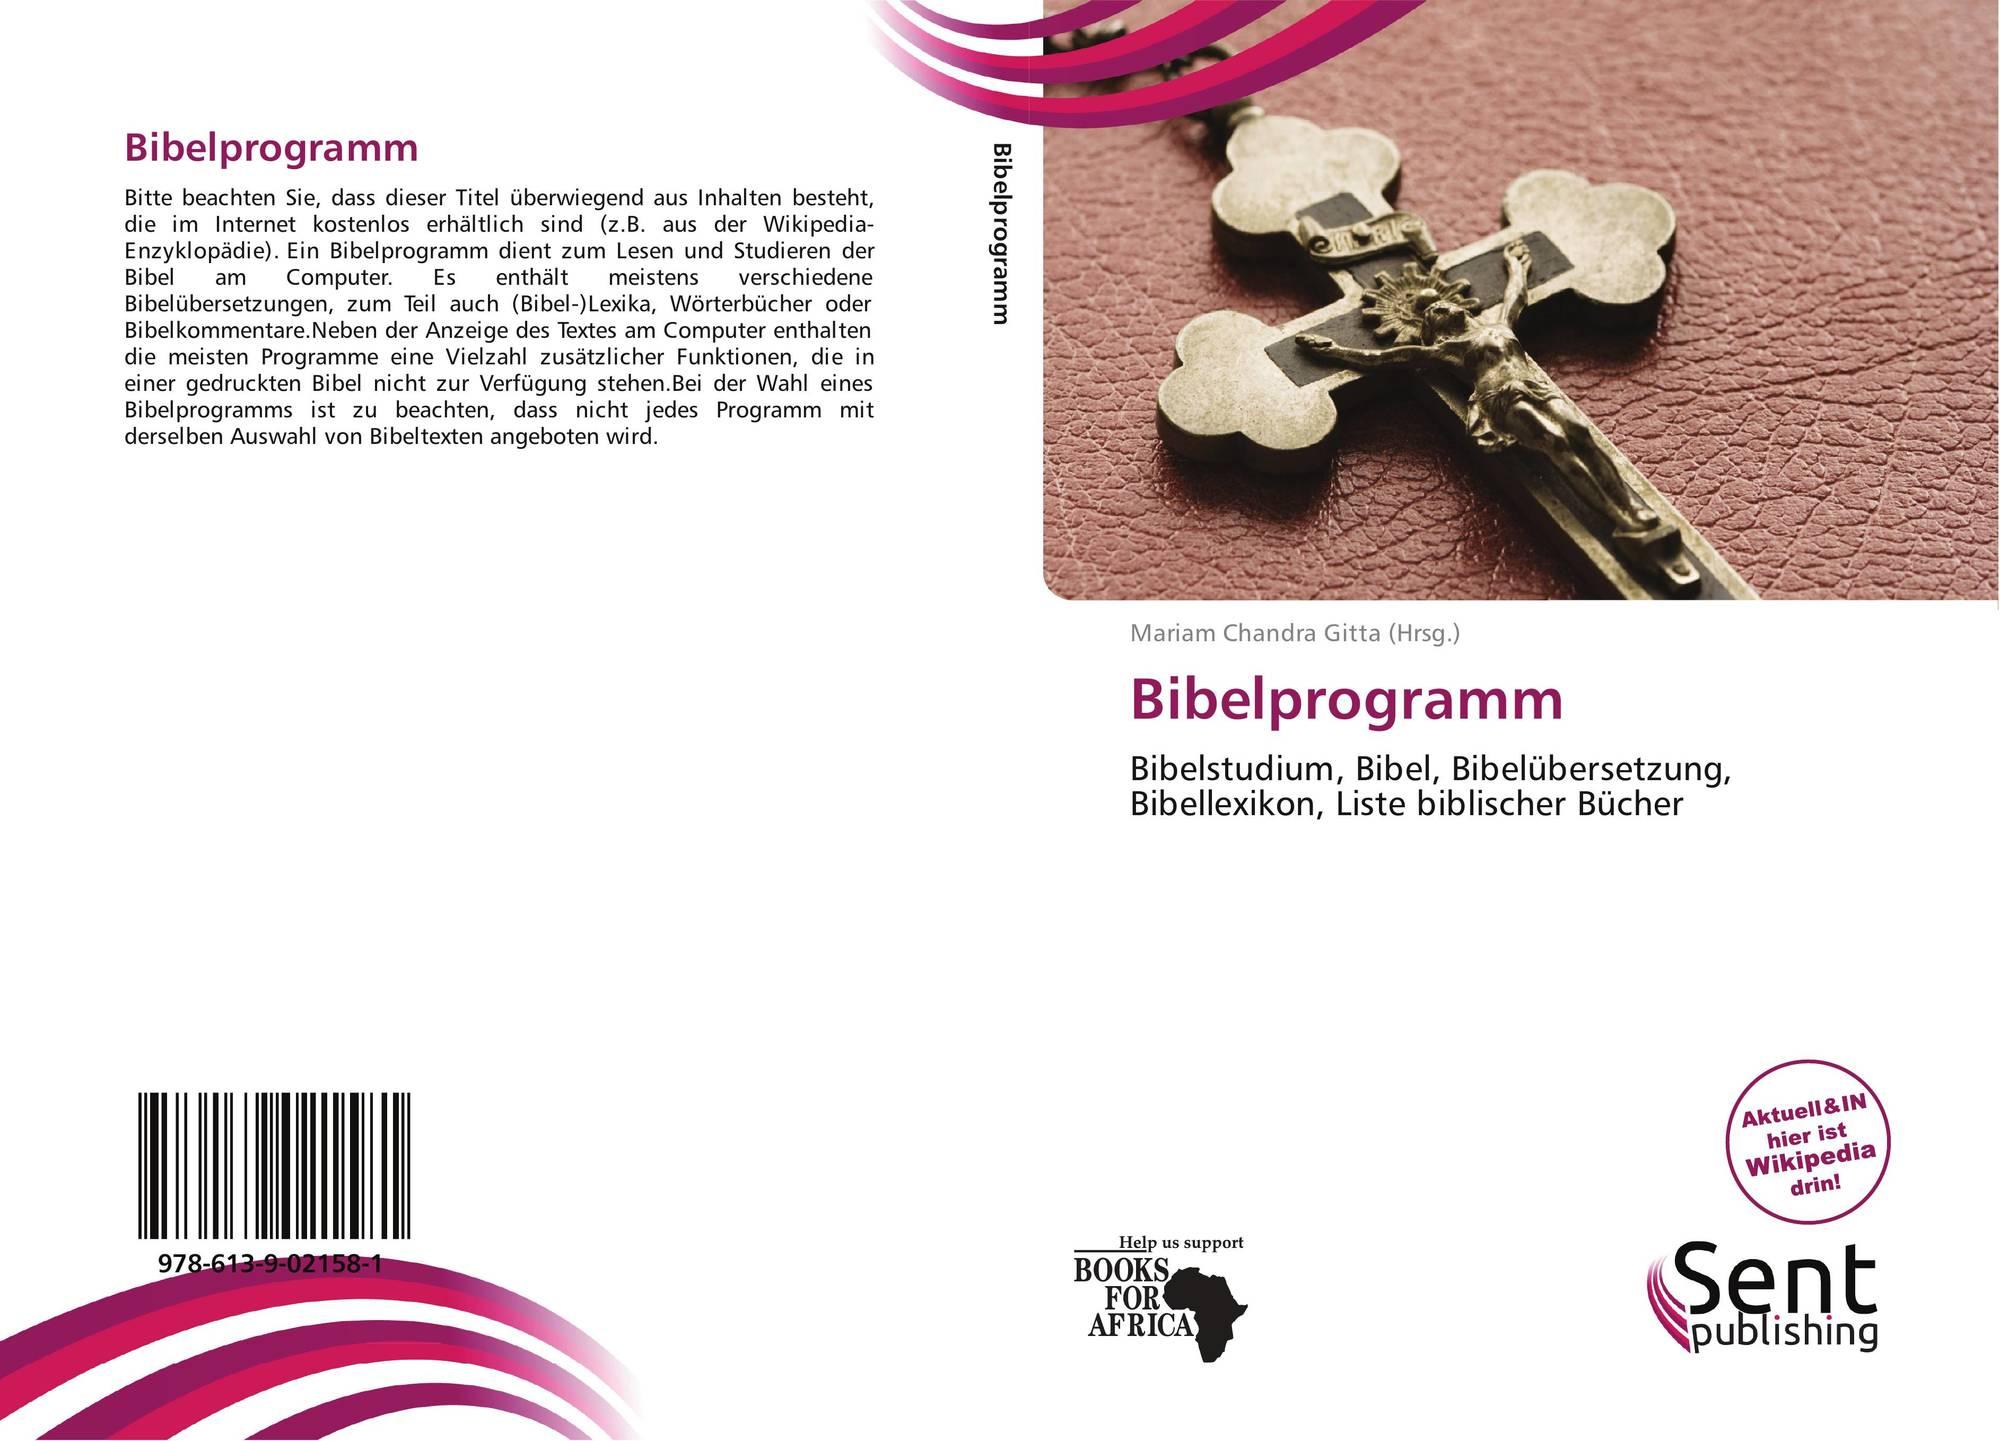 Bibelprogramm, 978-613-9-02158-1, 6139021588 ,9786139021581